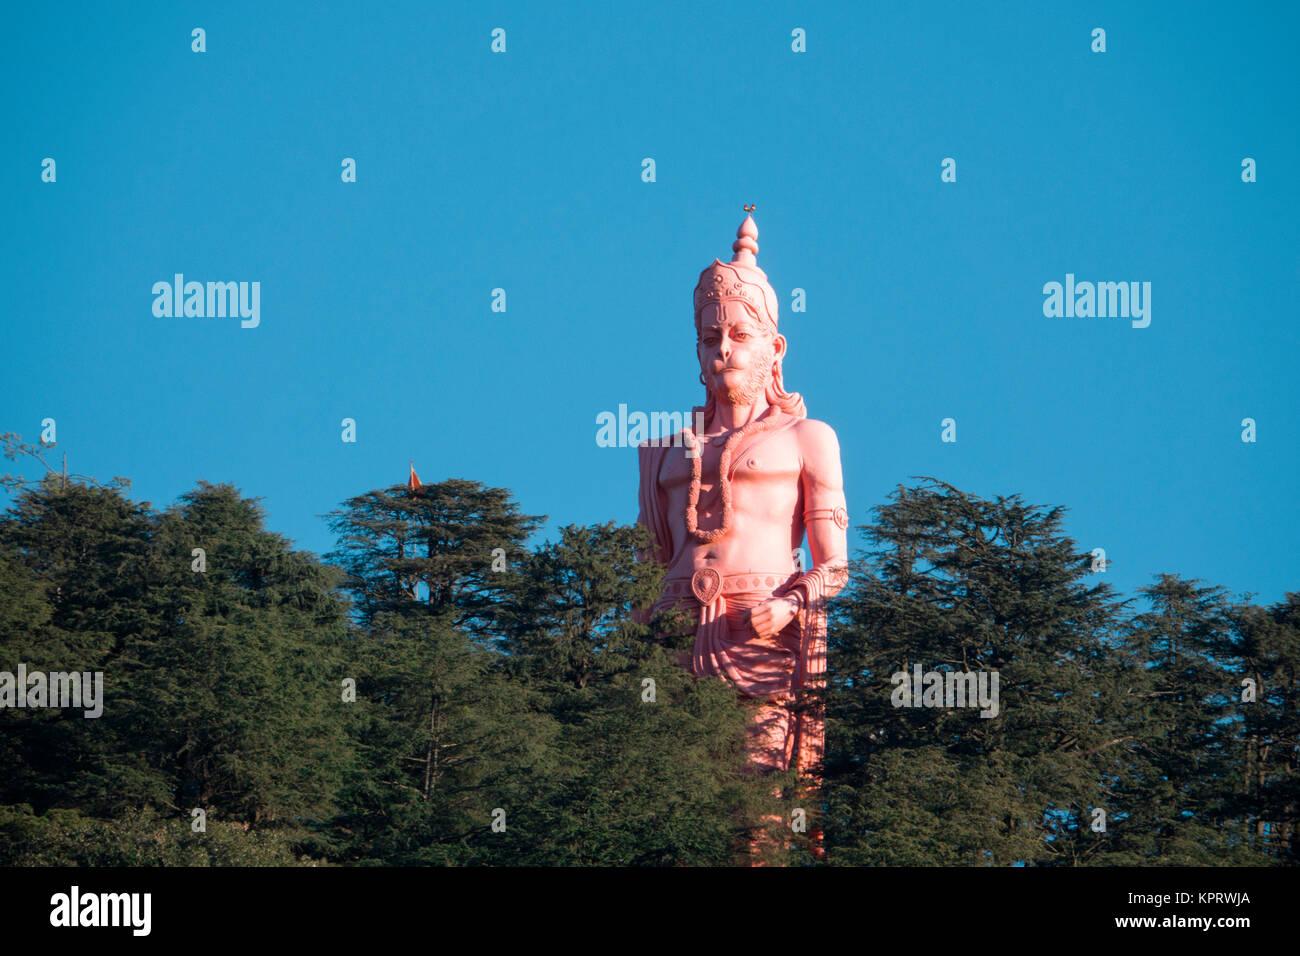 Hanuman Statue Stock Photos & Hanuman Statue Stock Images - Alamy